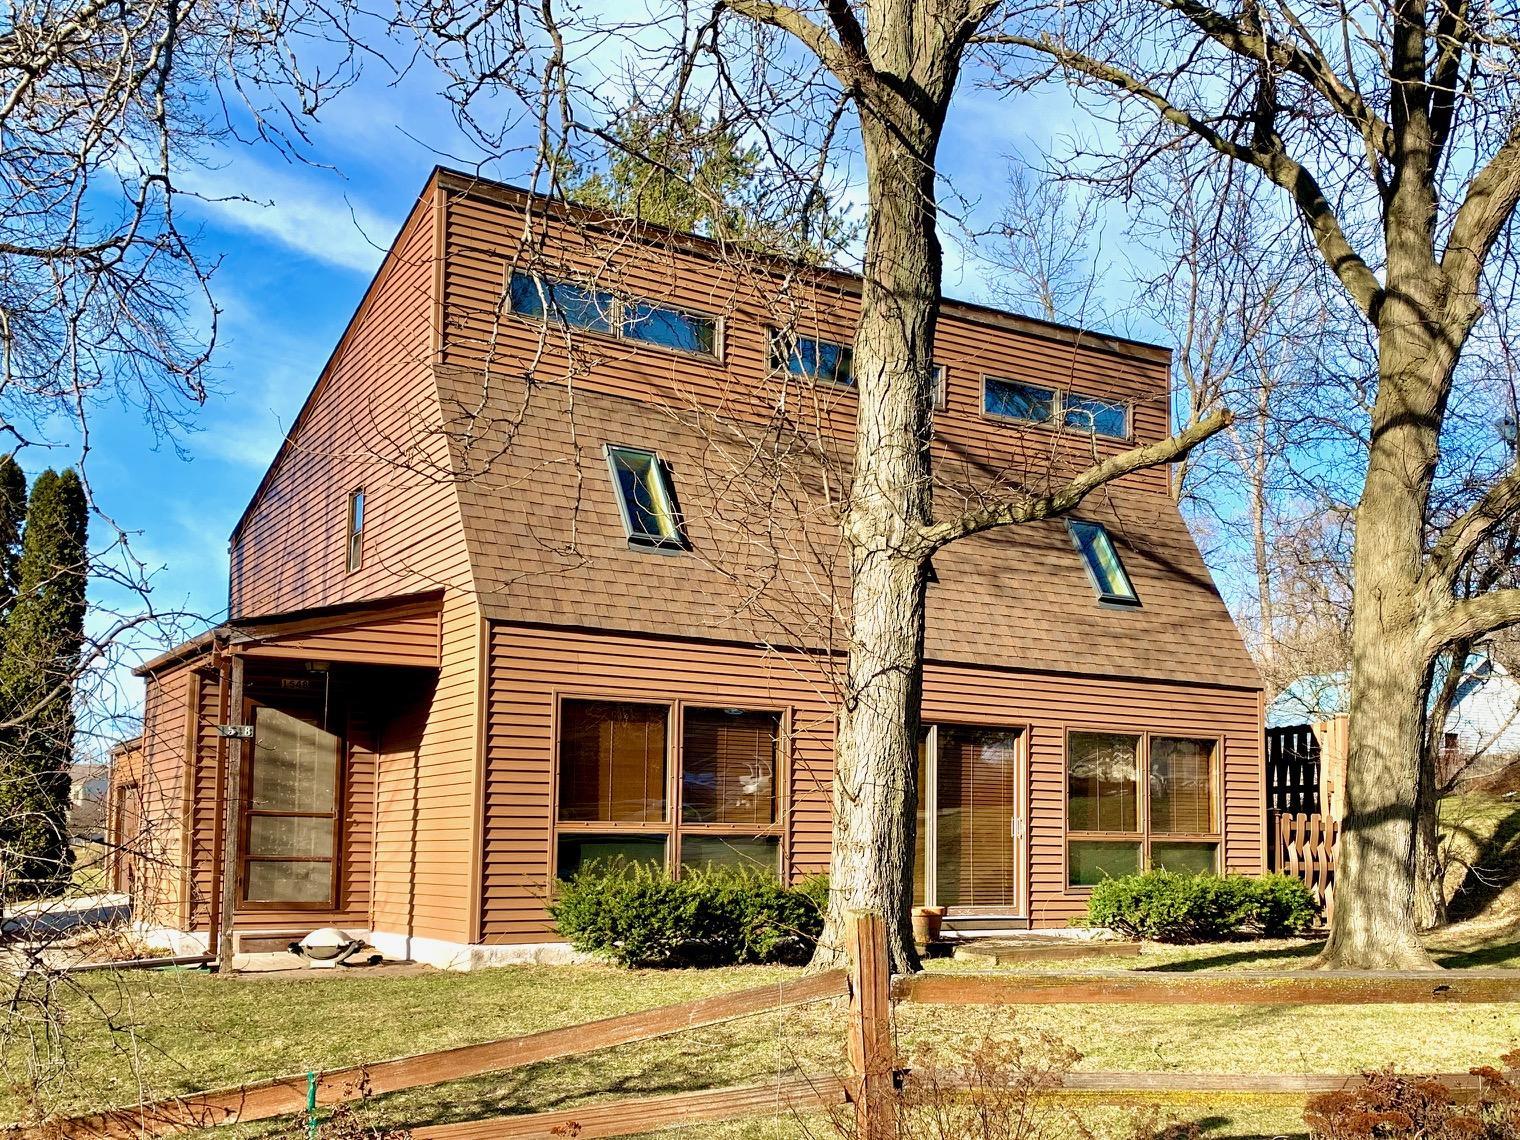 1548 Oconomowoc Ave, Watertown, Wisconsin 53094, 3 Bedrooms Bedrooms, ,2 BathroomsBathrooms,Single-Family,For Sale,Oconomowoc Ave,1681457